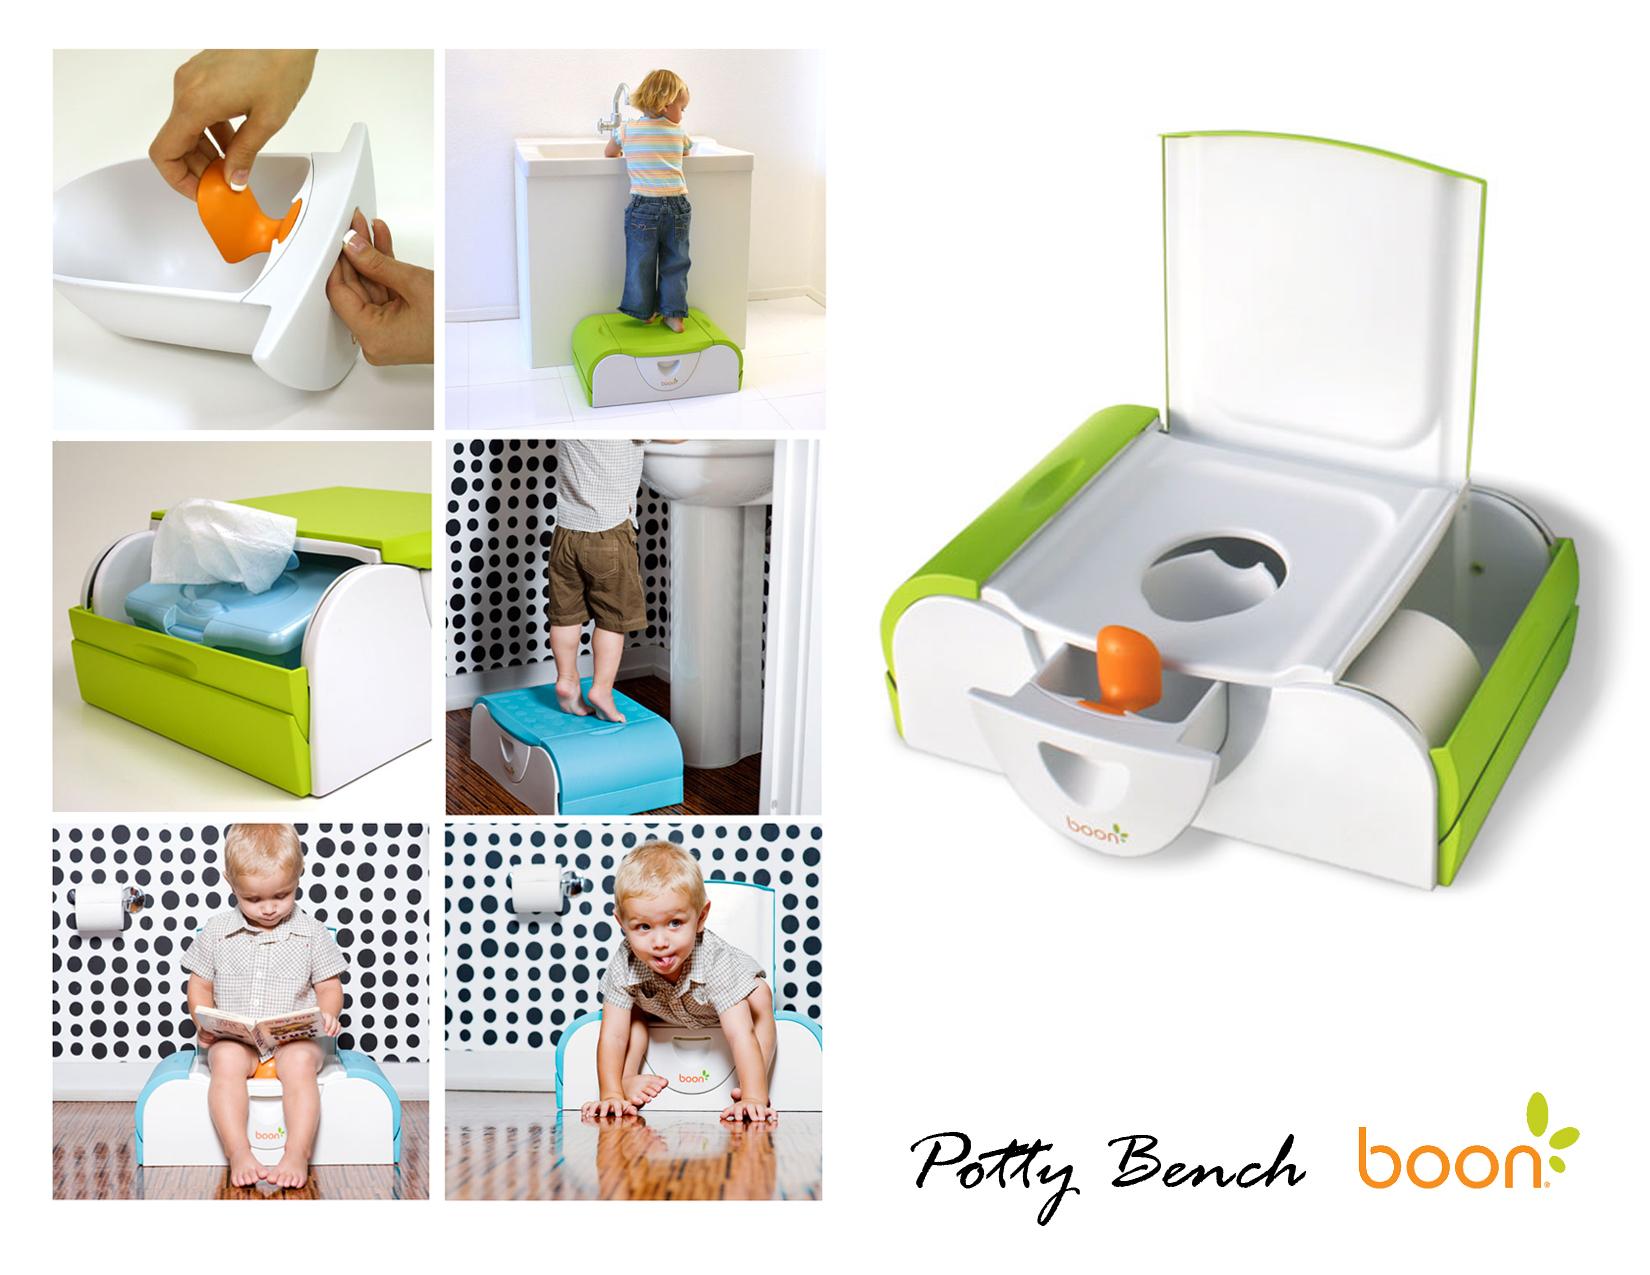 boon potty bench by t j manion at coroflot com